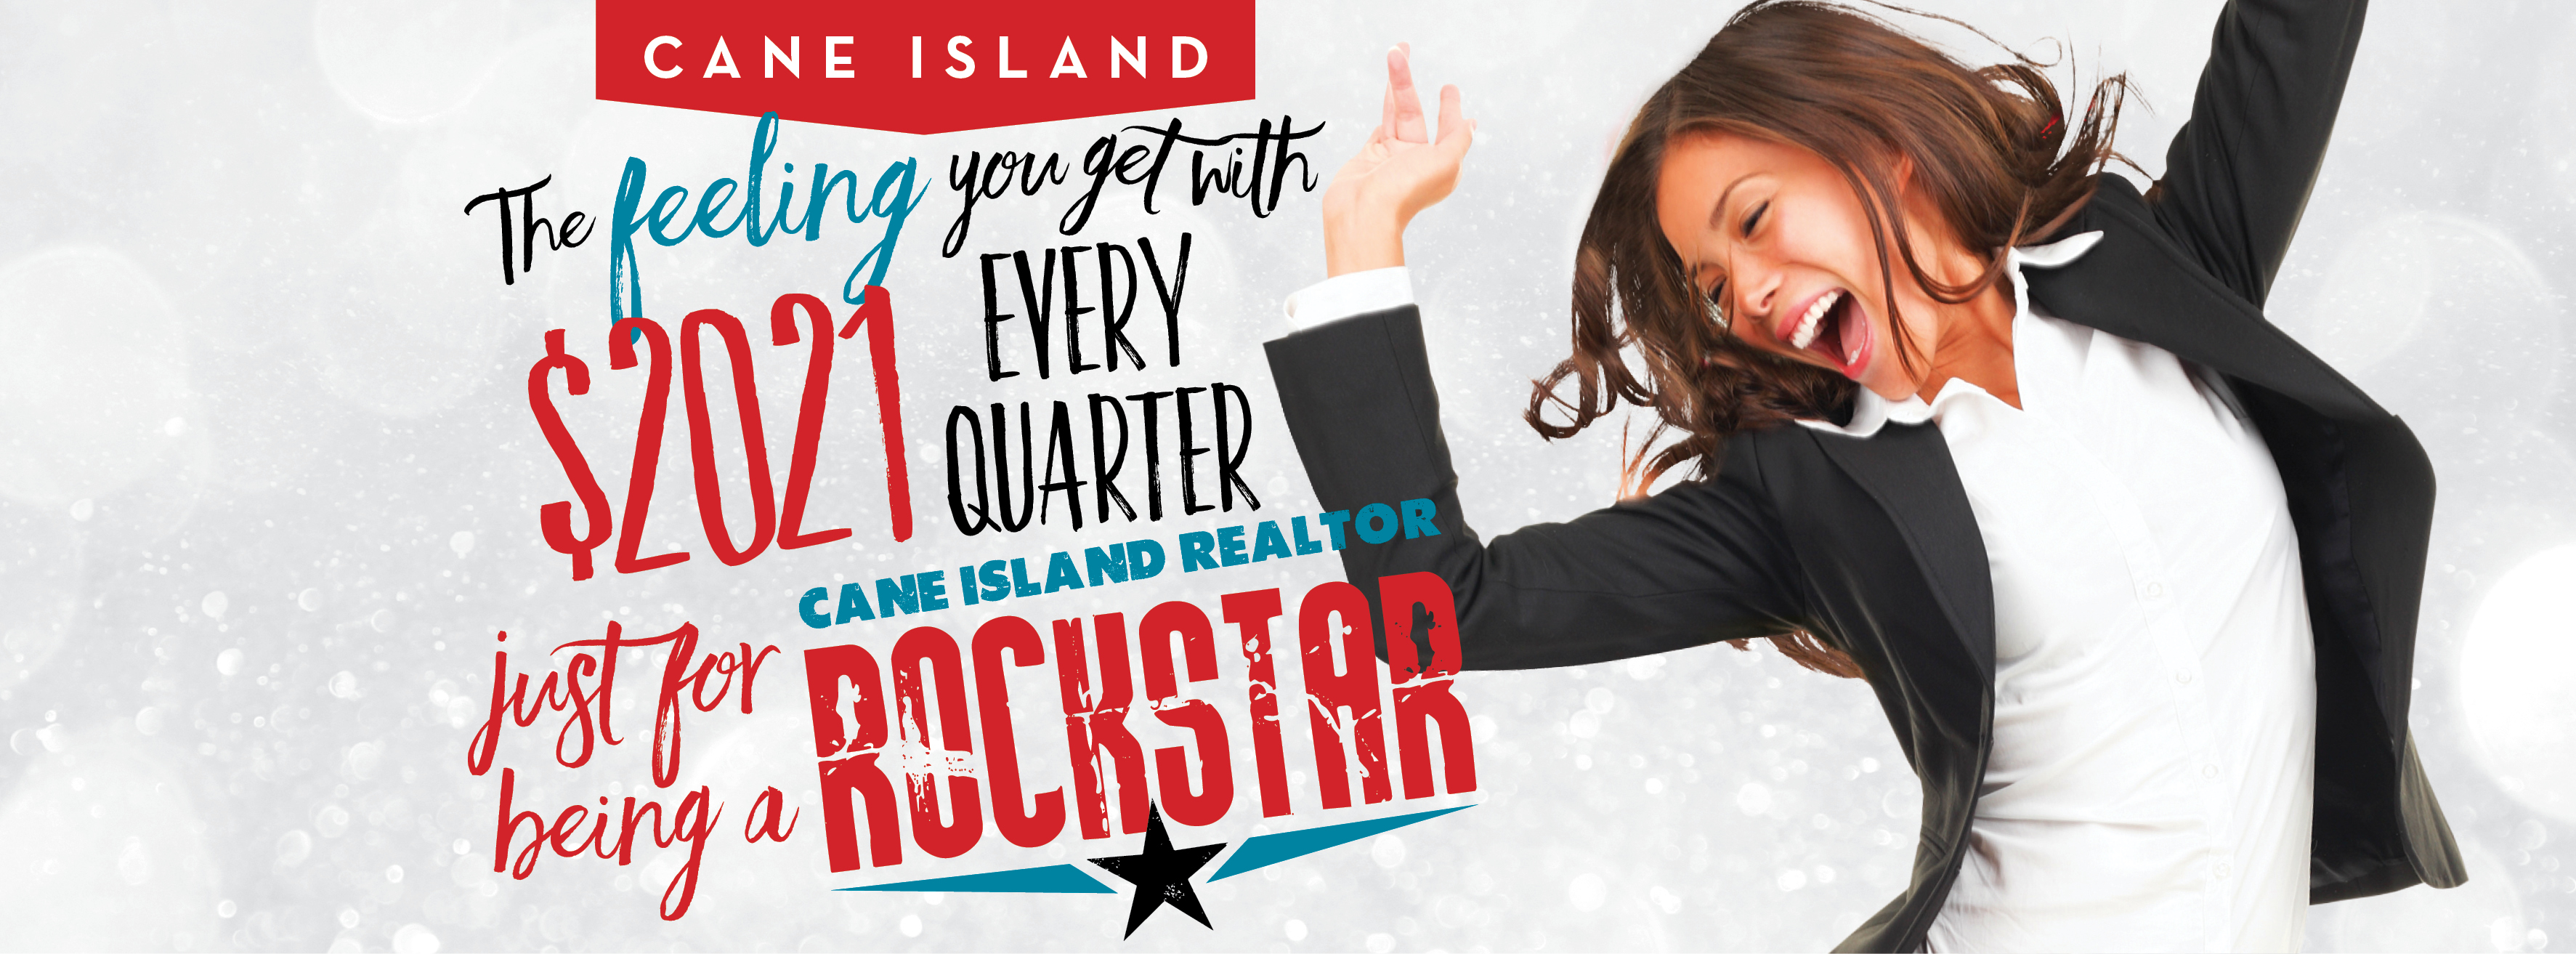 Cash for Cane Island Top Realtors